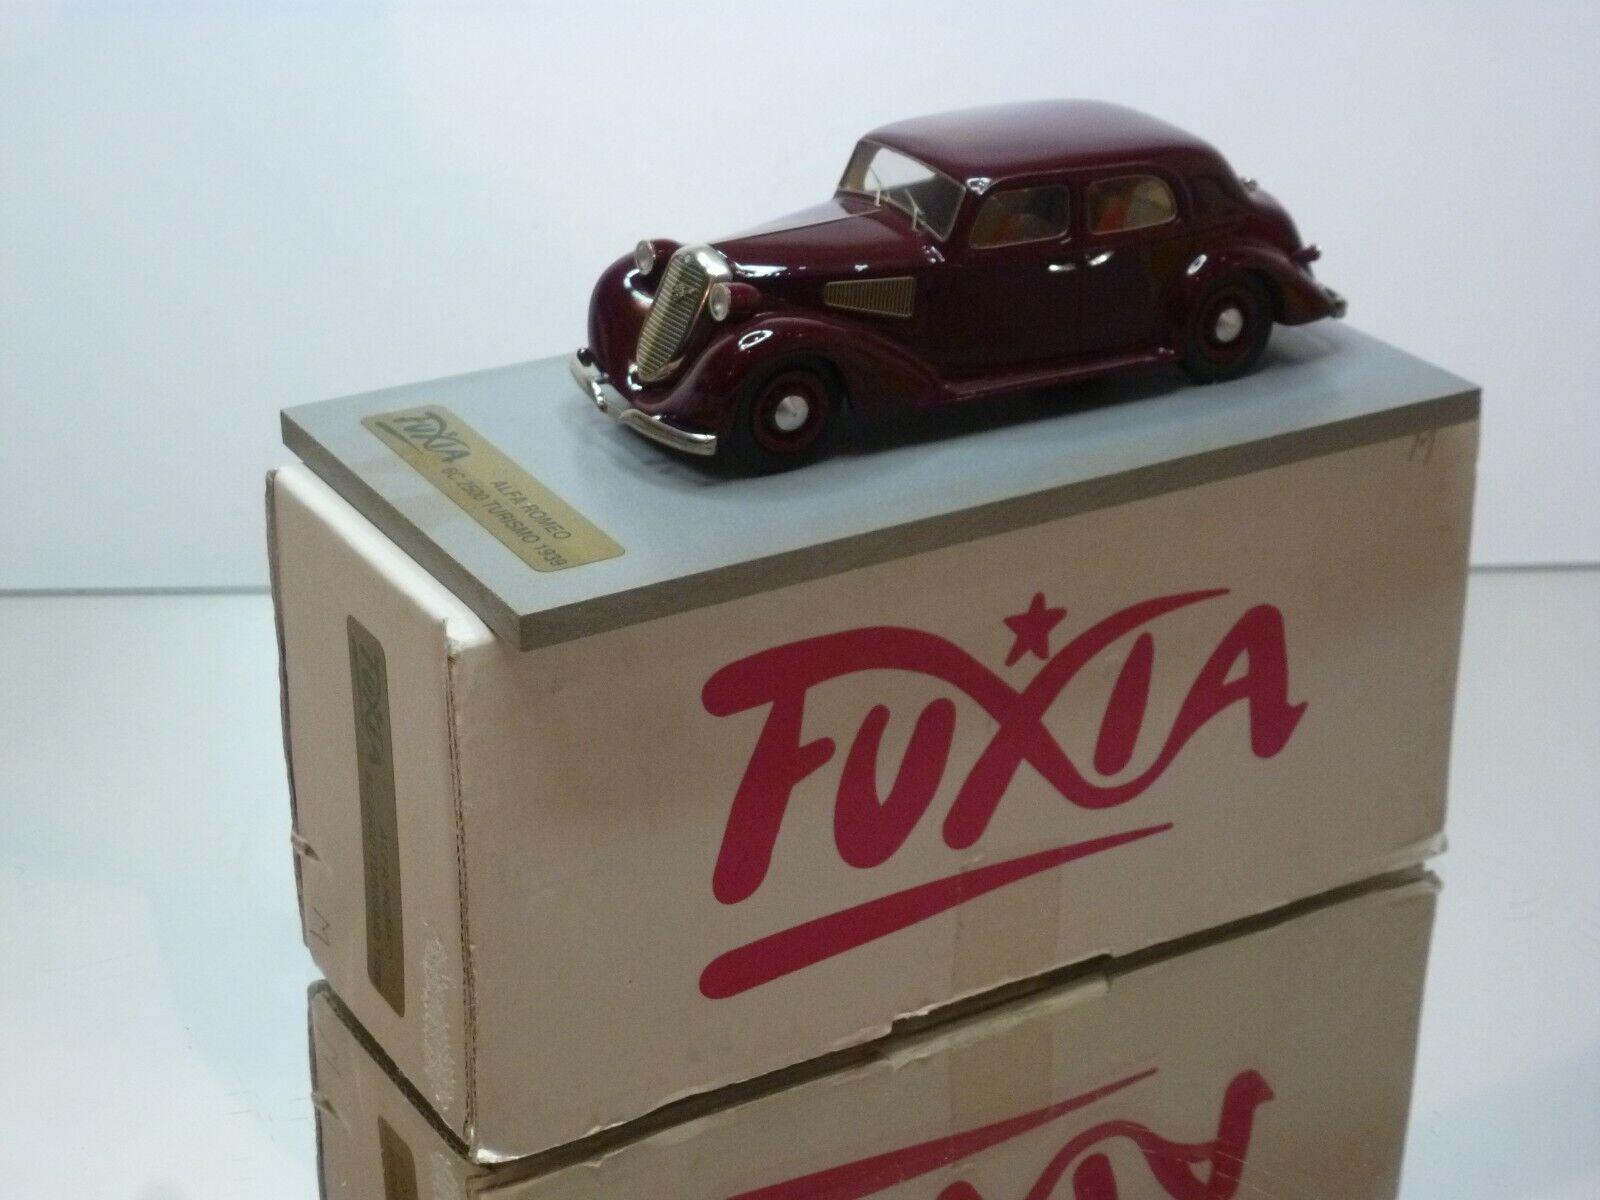 Fuxia Alfa Romeo 6c 2500 turismo 1939 rojo oscuro 1 1 1  43 caja muy buena. 909